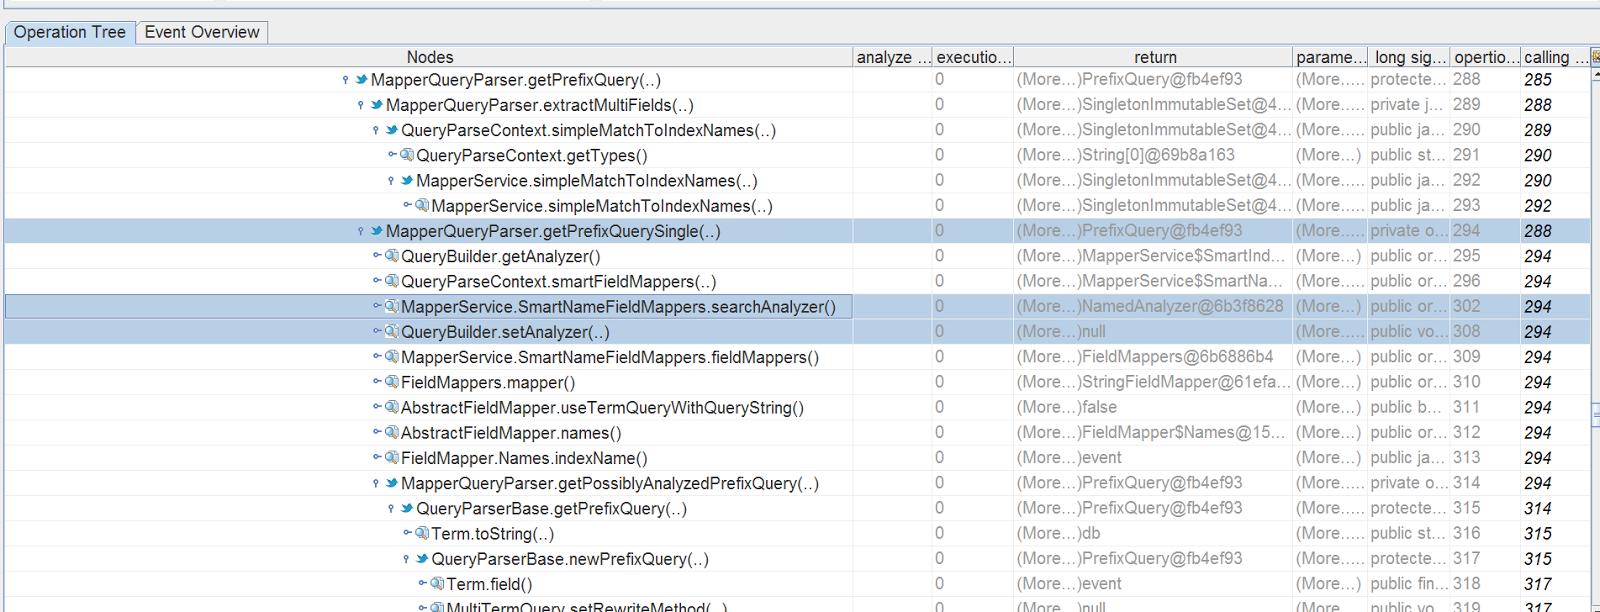 PerfSpy: Phrase search on not_analyzed fields?